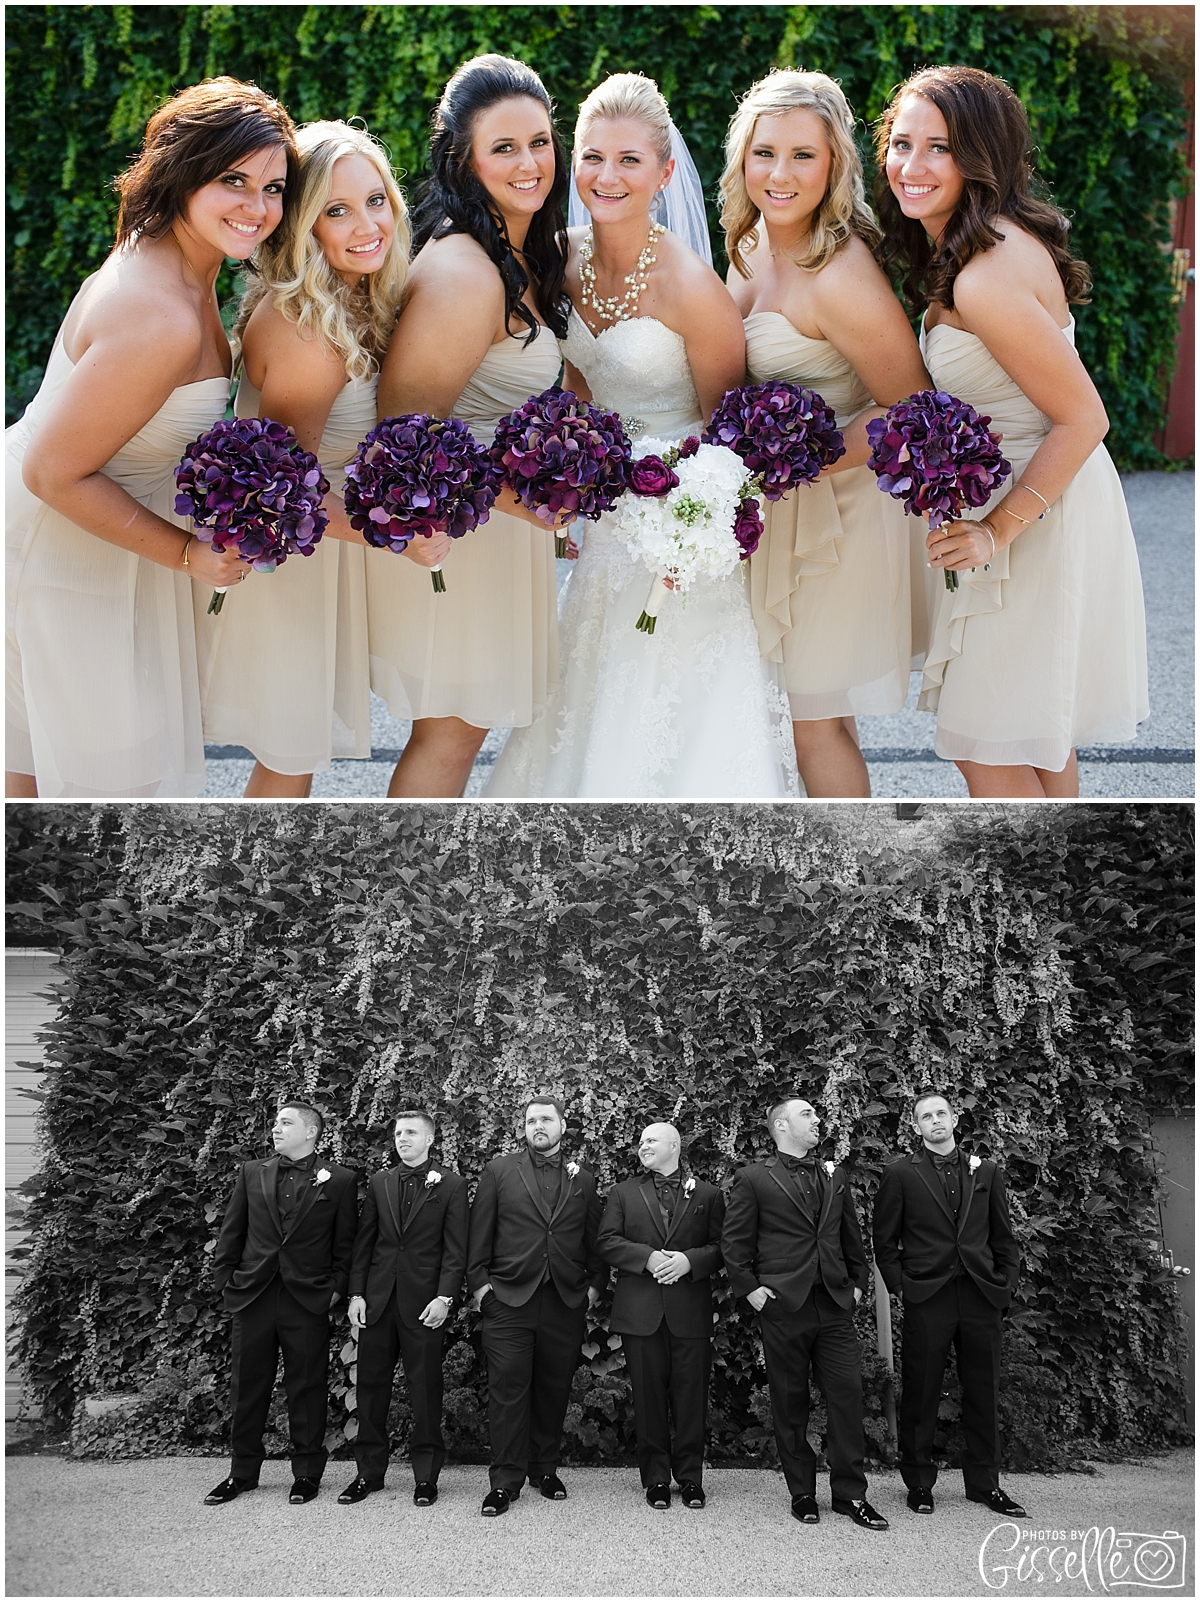 S_D_BLUMEN_GARDENS_WEDDING_PHOTOS_0032.jpg